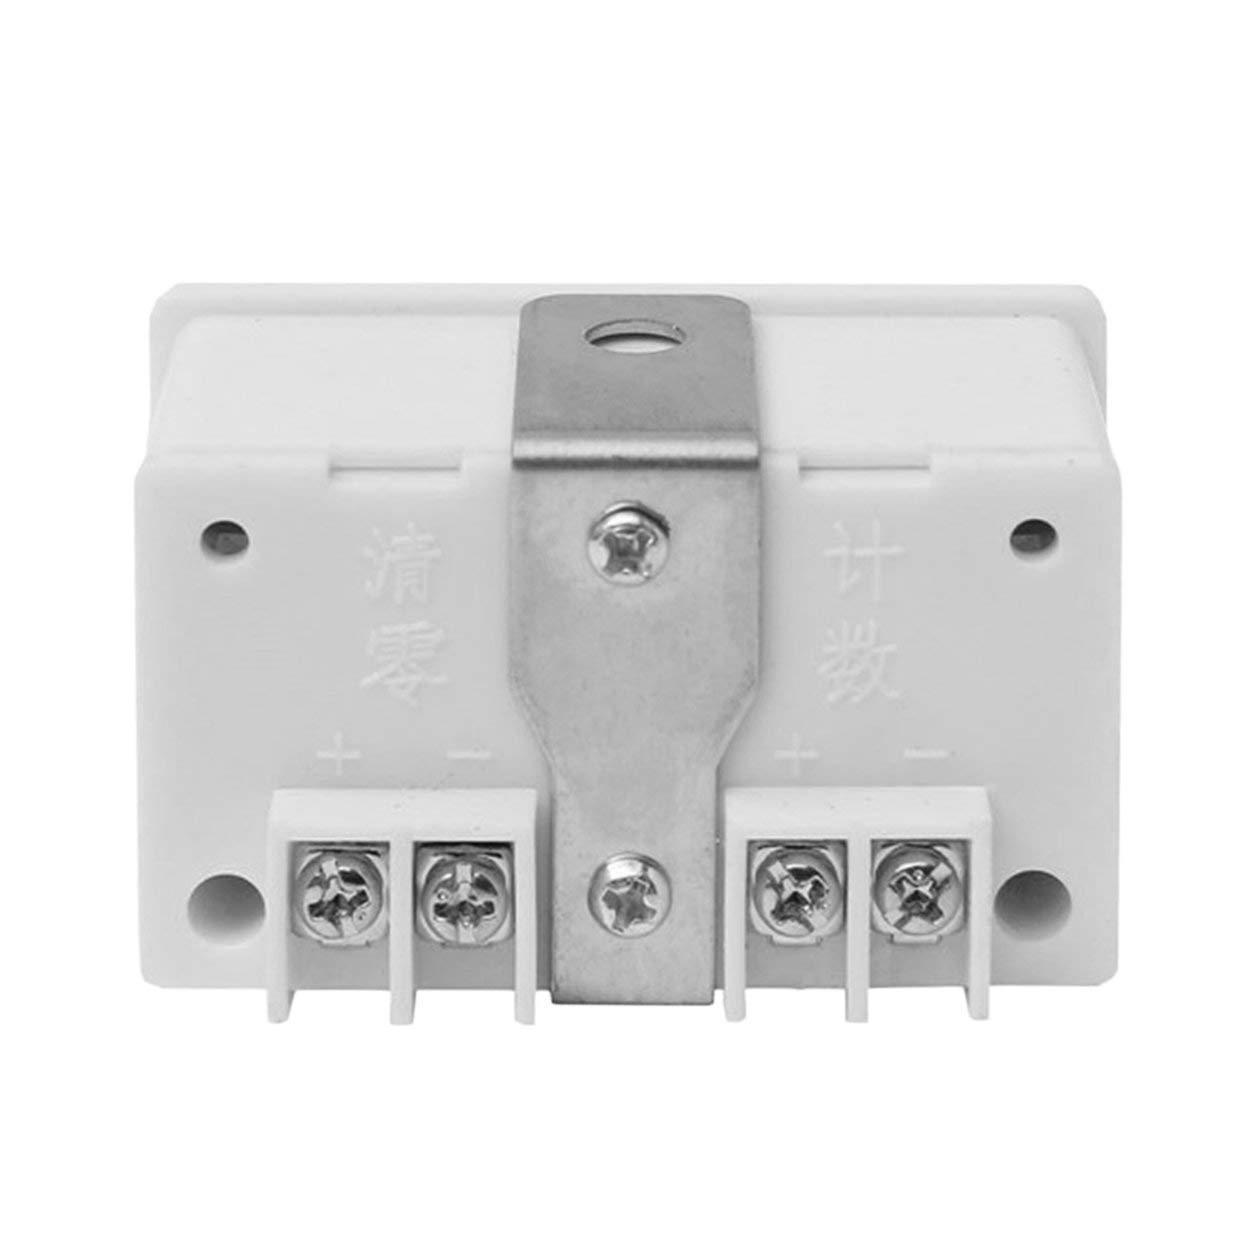 Heraihe Golpe pr/áctica Digital Contador electr/ónico magn/ético inductivo LCD Pantalla Interruptor de proximidad Ronda poderoso im/án TT-5J